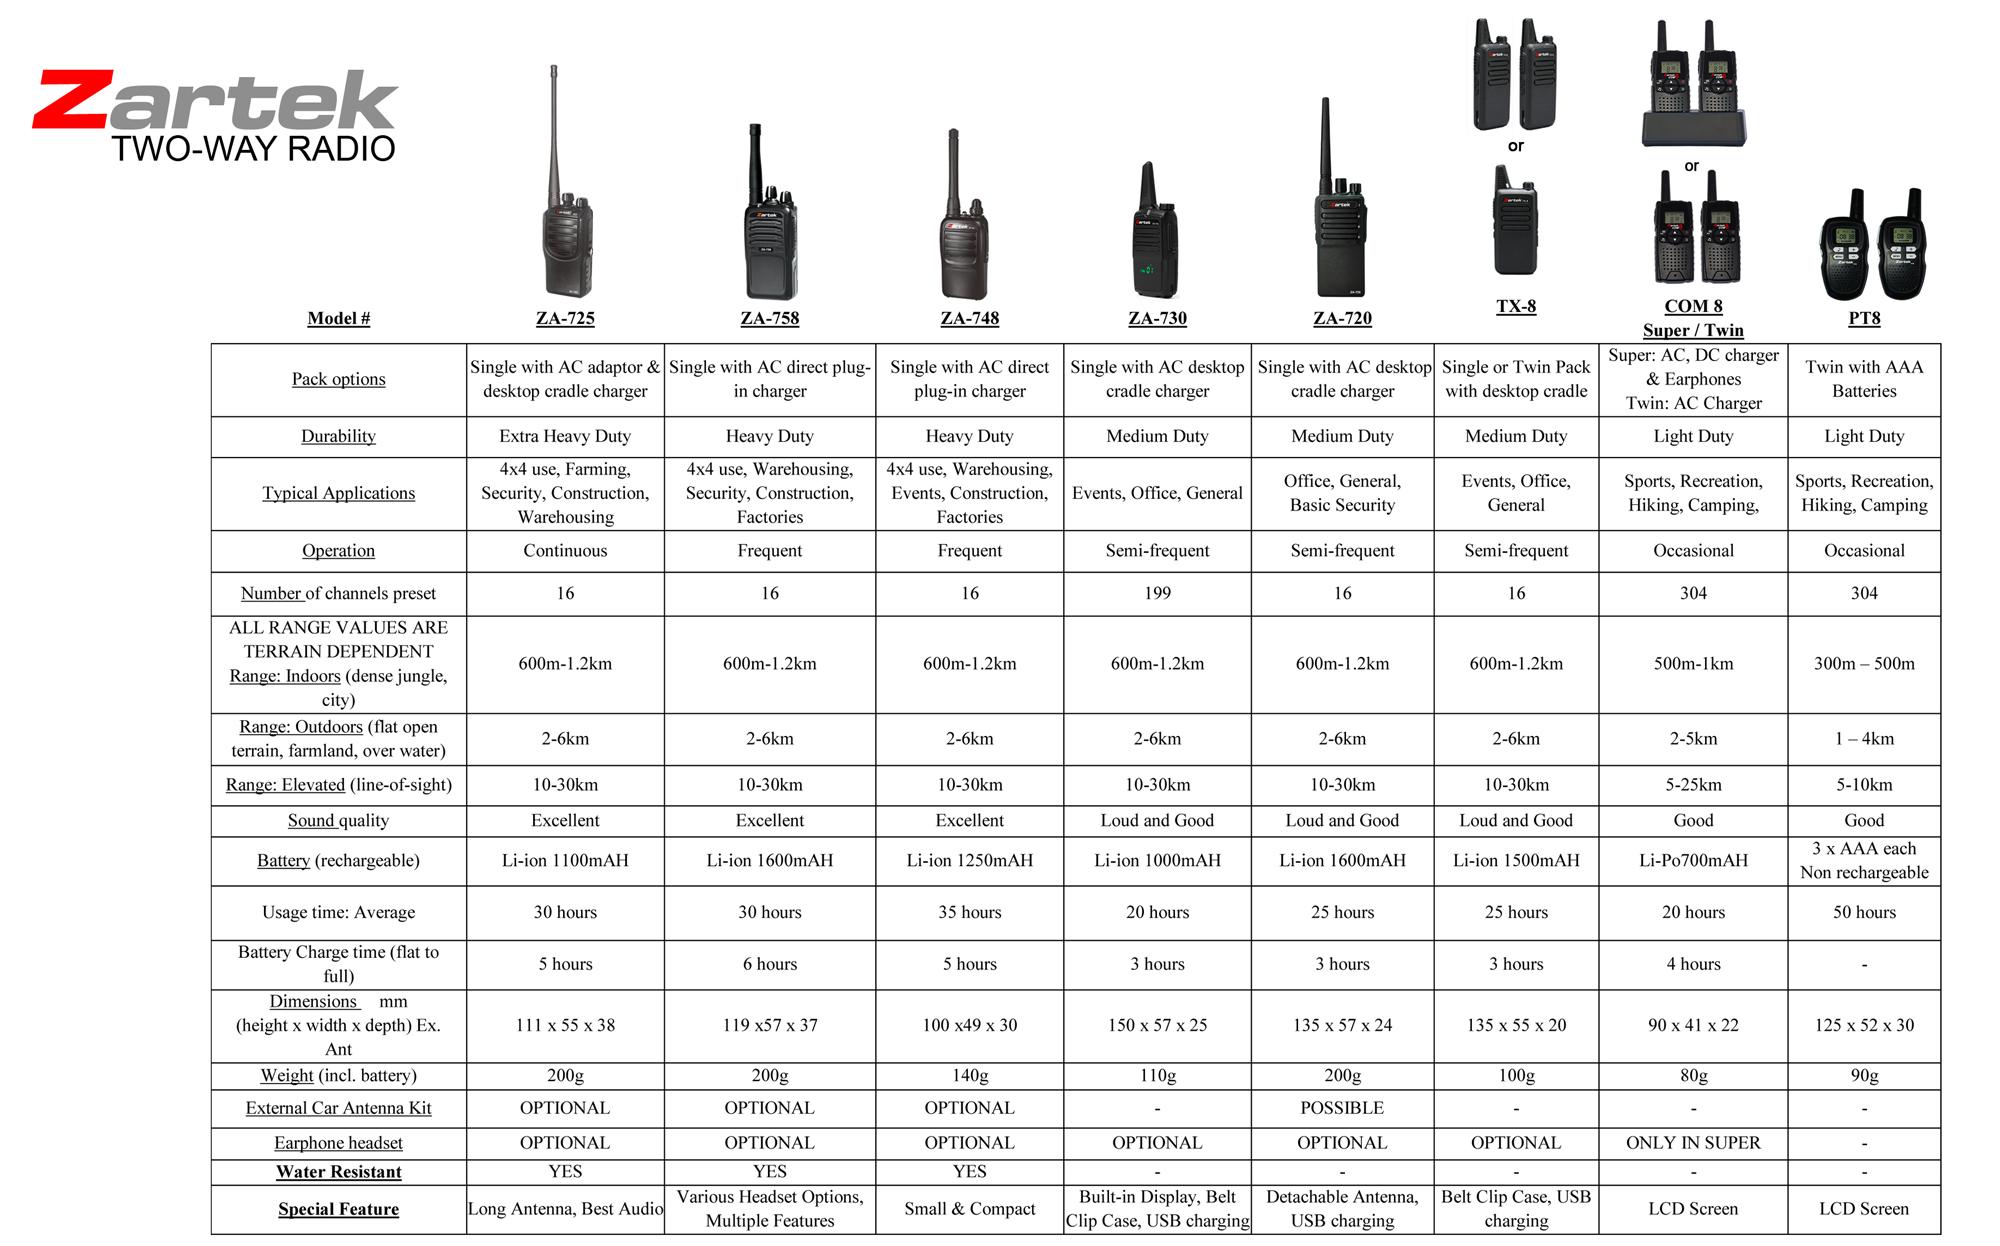 Comparison of Unicode encodings